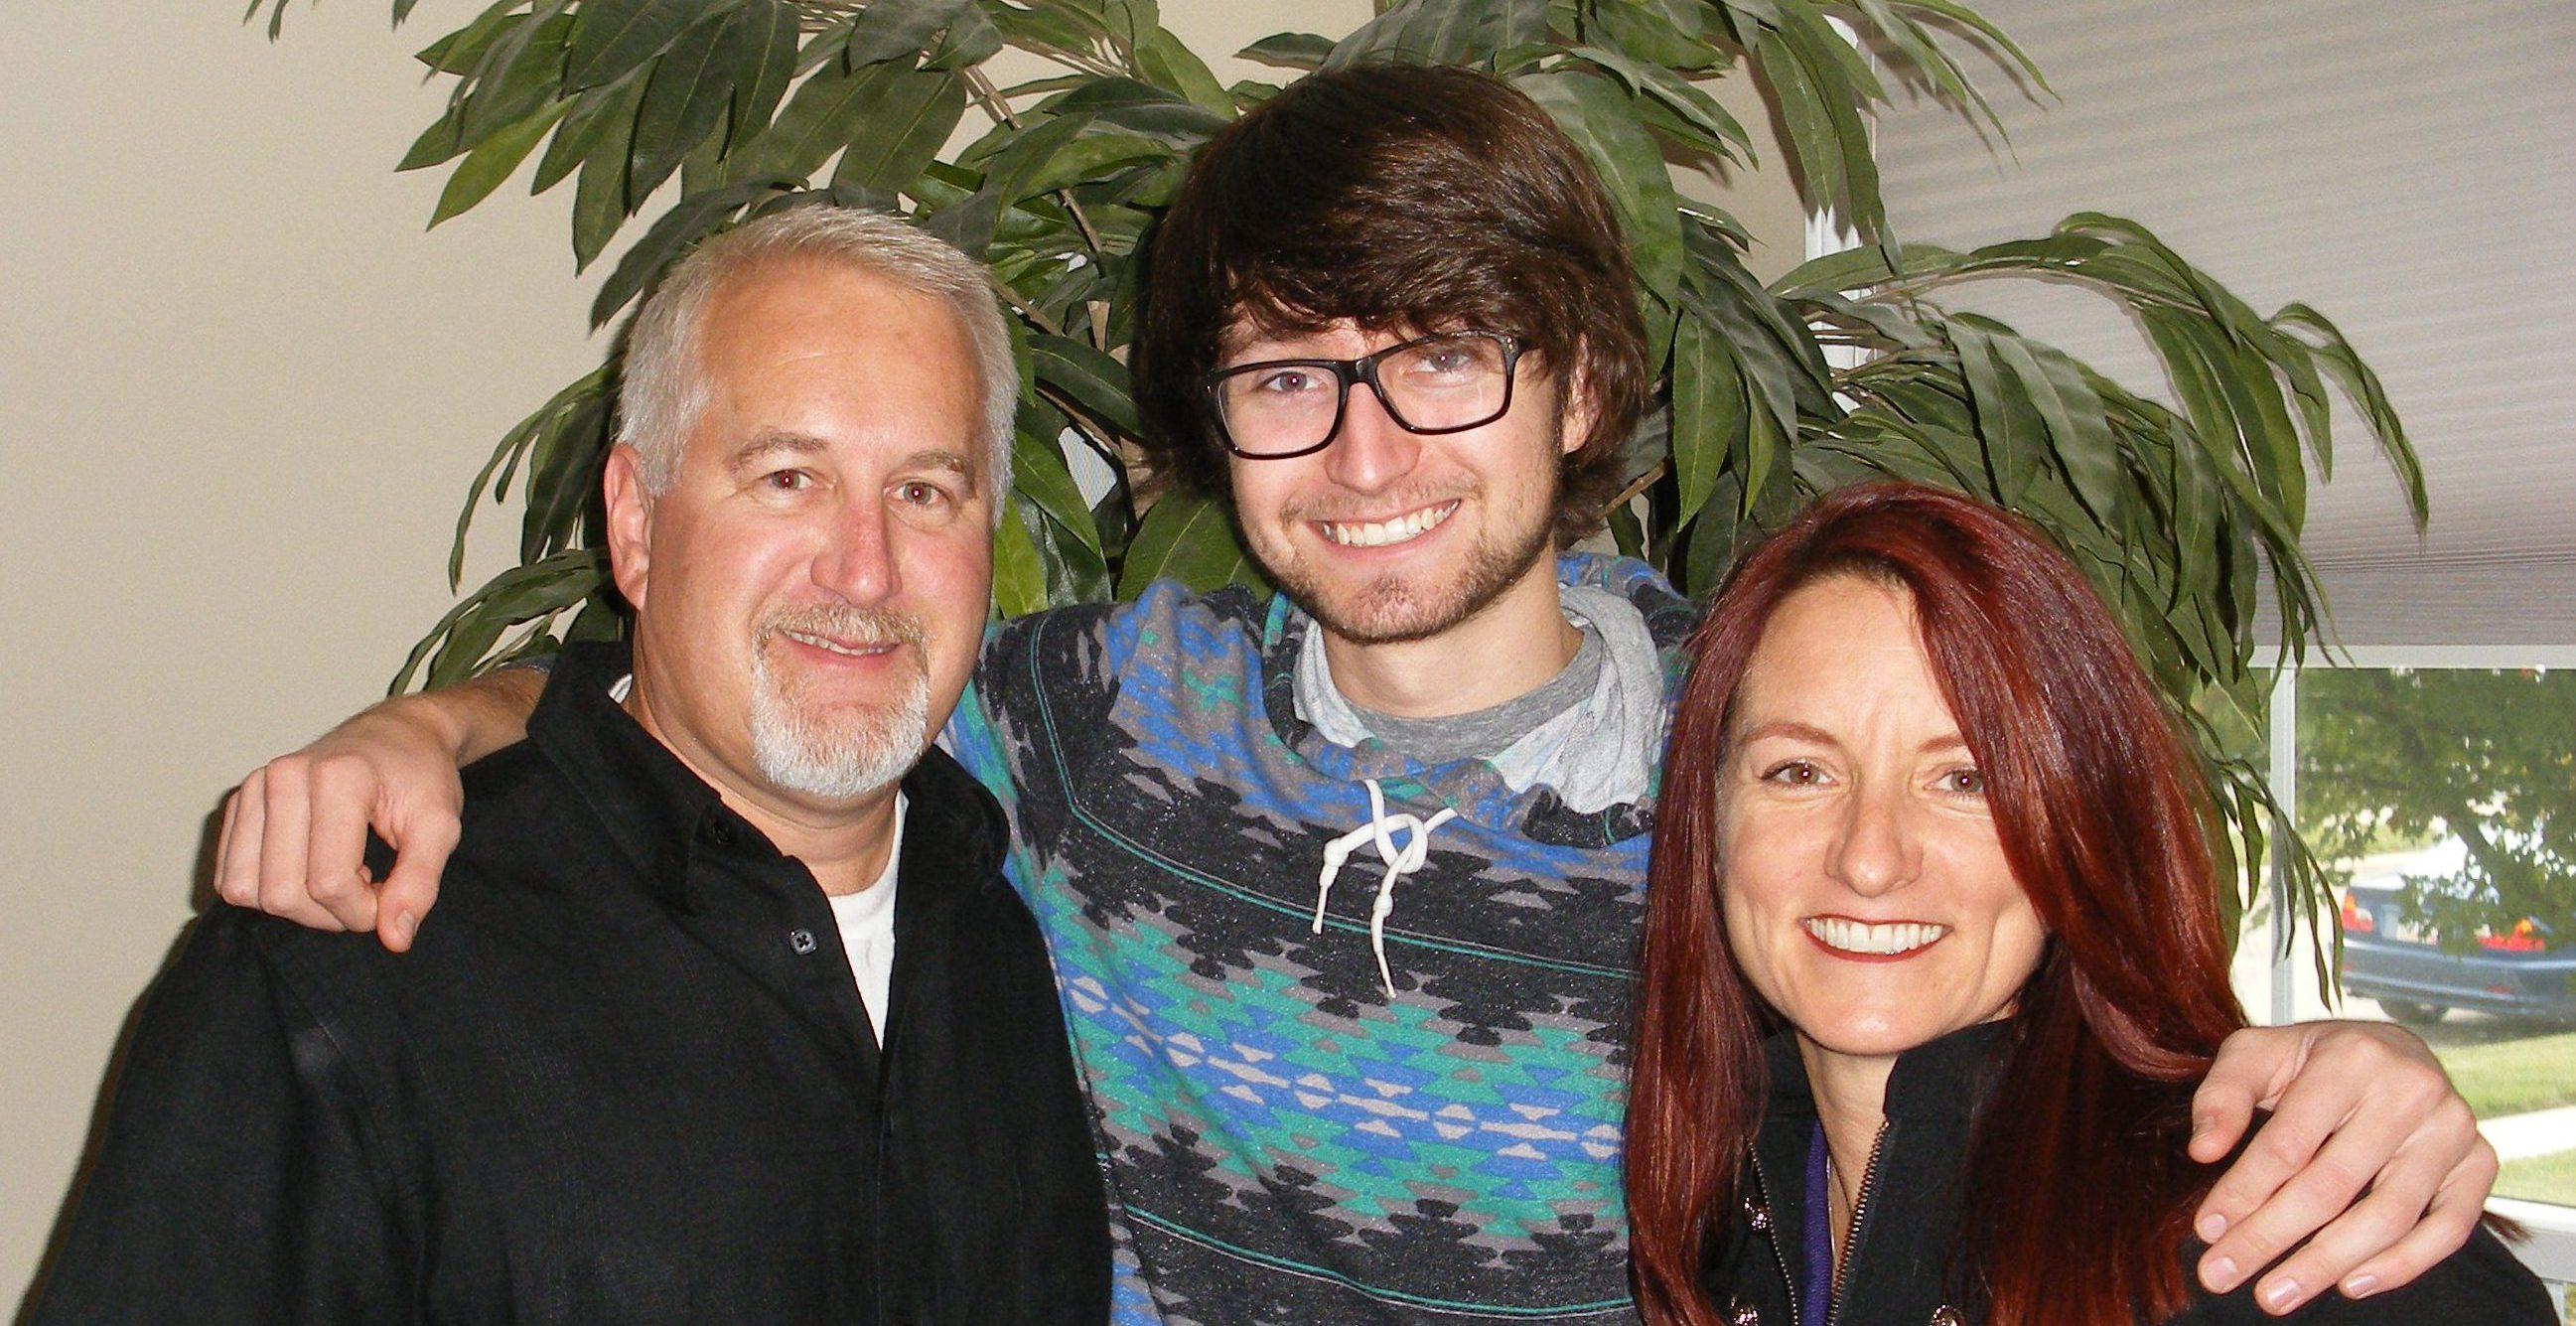 Bob, Ian, and Teresa at Bob's House for Ian's 21st birthday